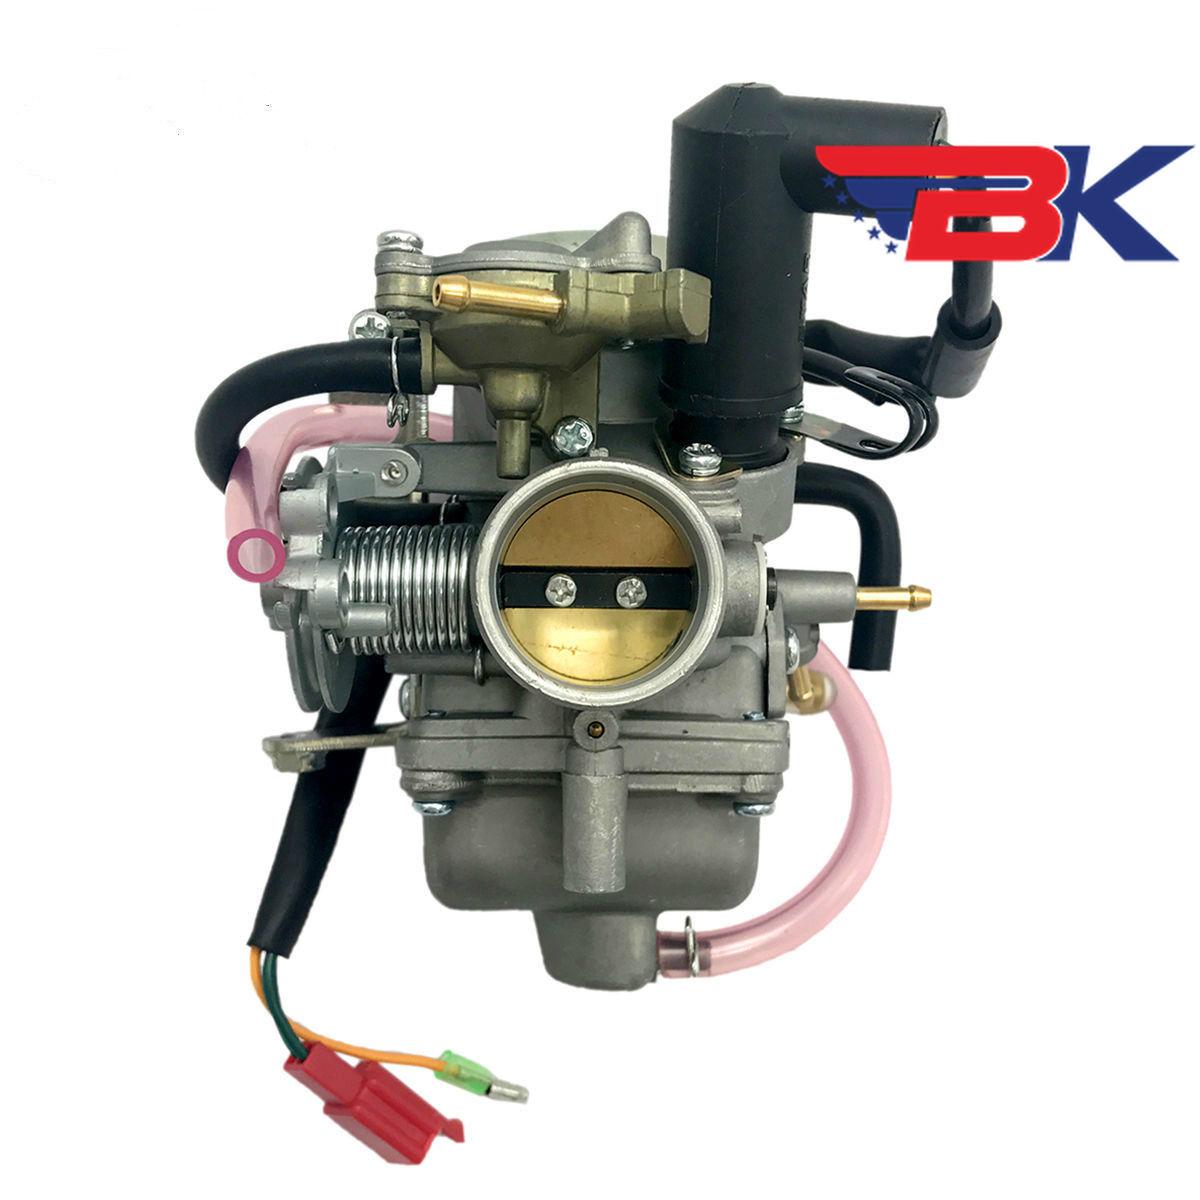 Carburetor For Honda Helix CN 250 CN250 Scooter Carb Assembly 1986-2008